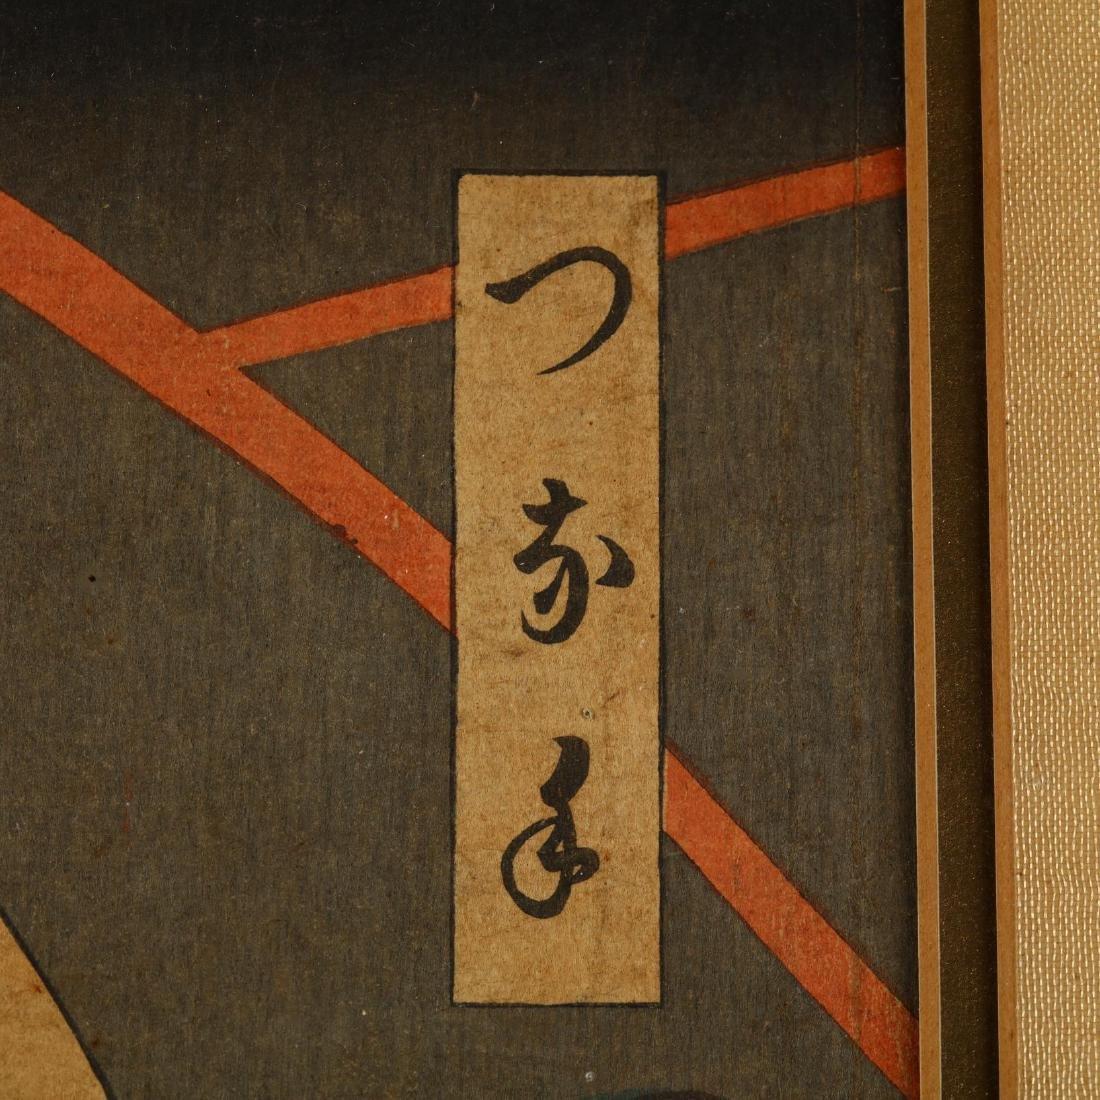 Two Japanese Woodblock Prints by Kunisada and Kuniyoshi - 10